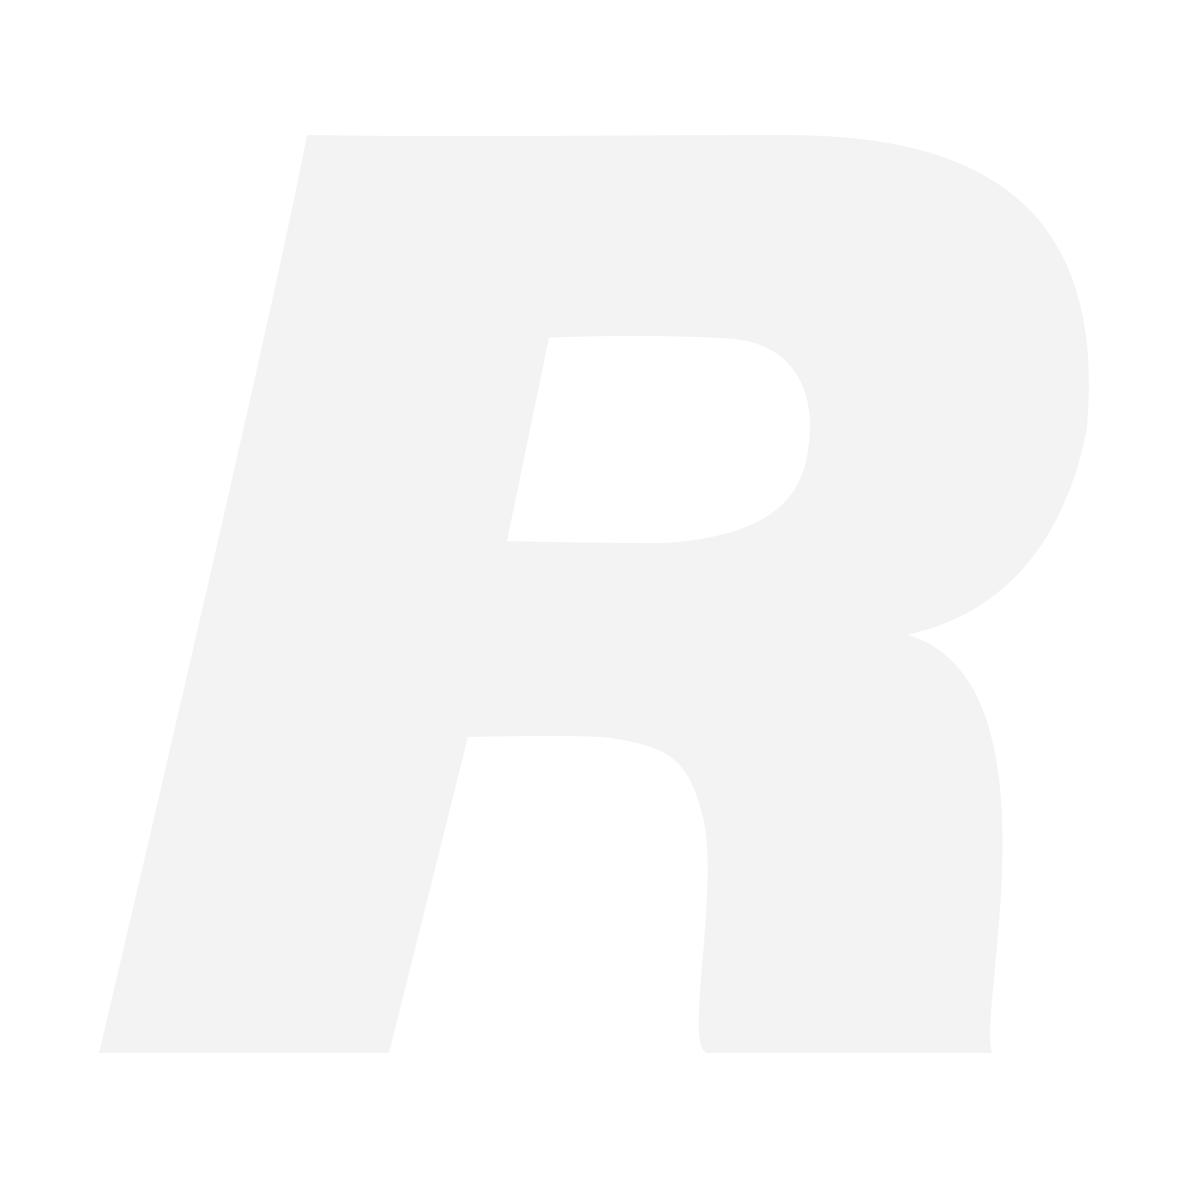 SAMYANG E-MOUNT 10mm f/2.8 ED AS NCS KÄYTETTY